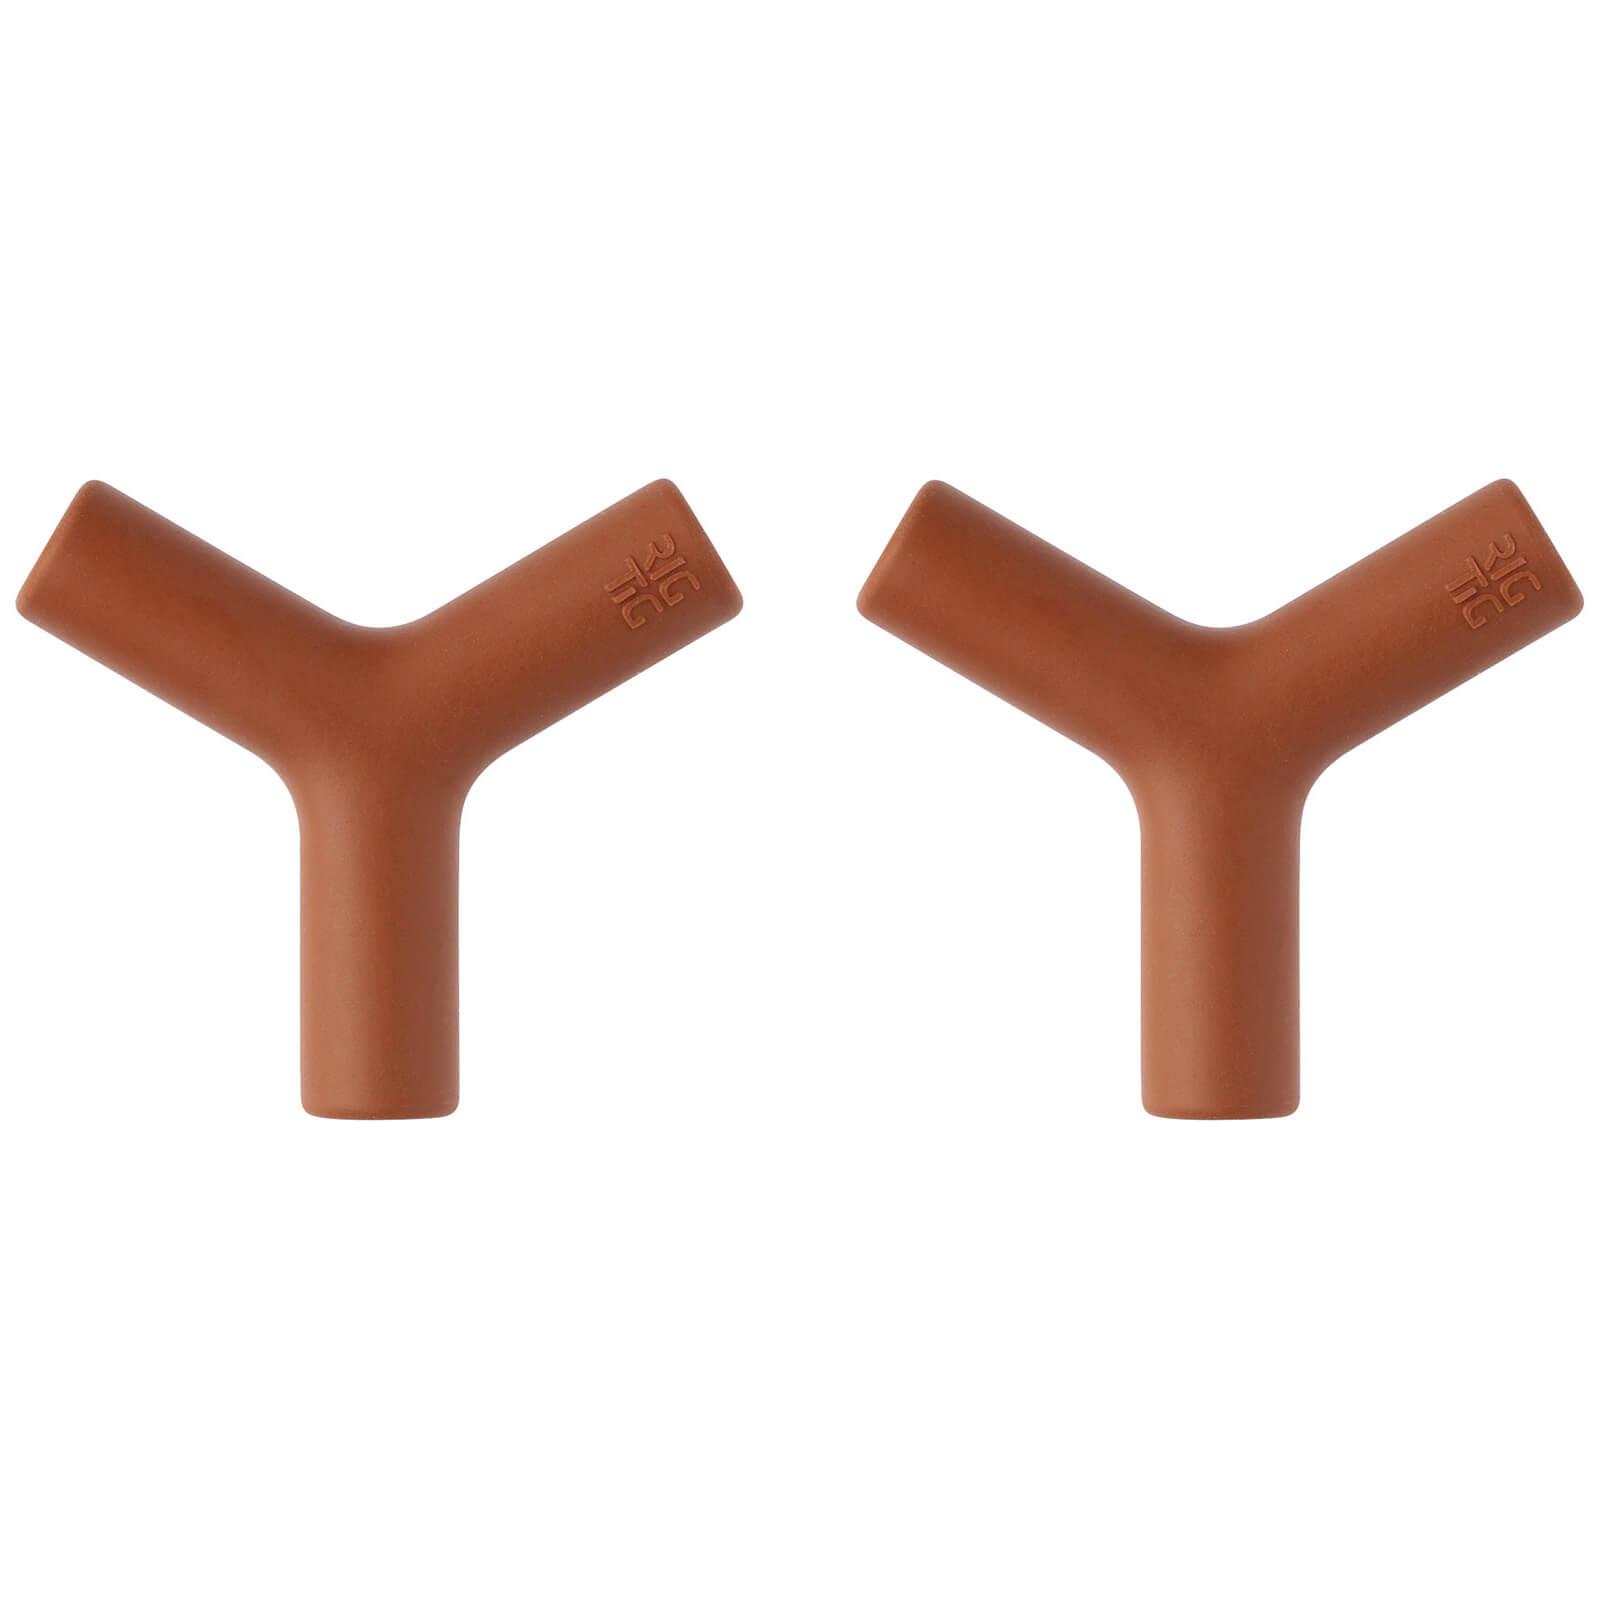 RIG-TIG Hang-It Knobs Set of 2 - Terracotta